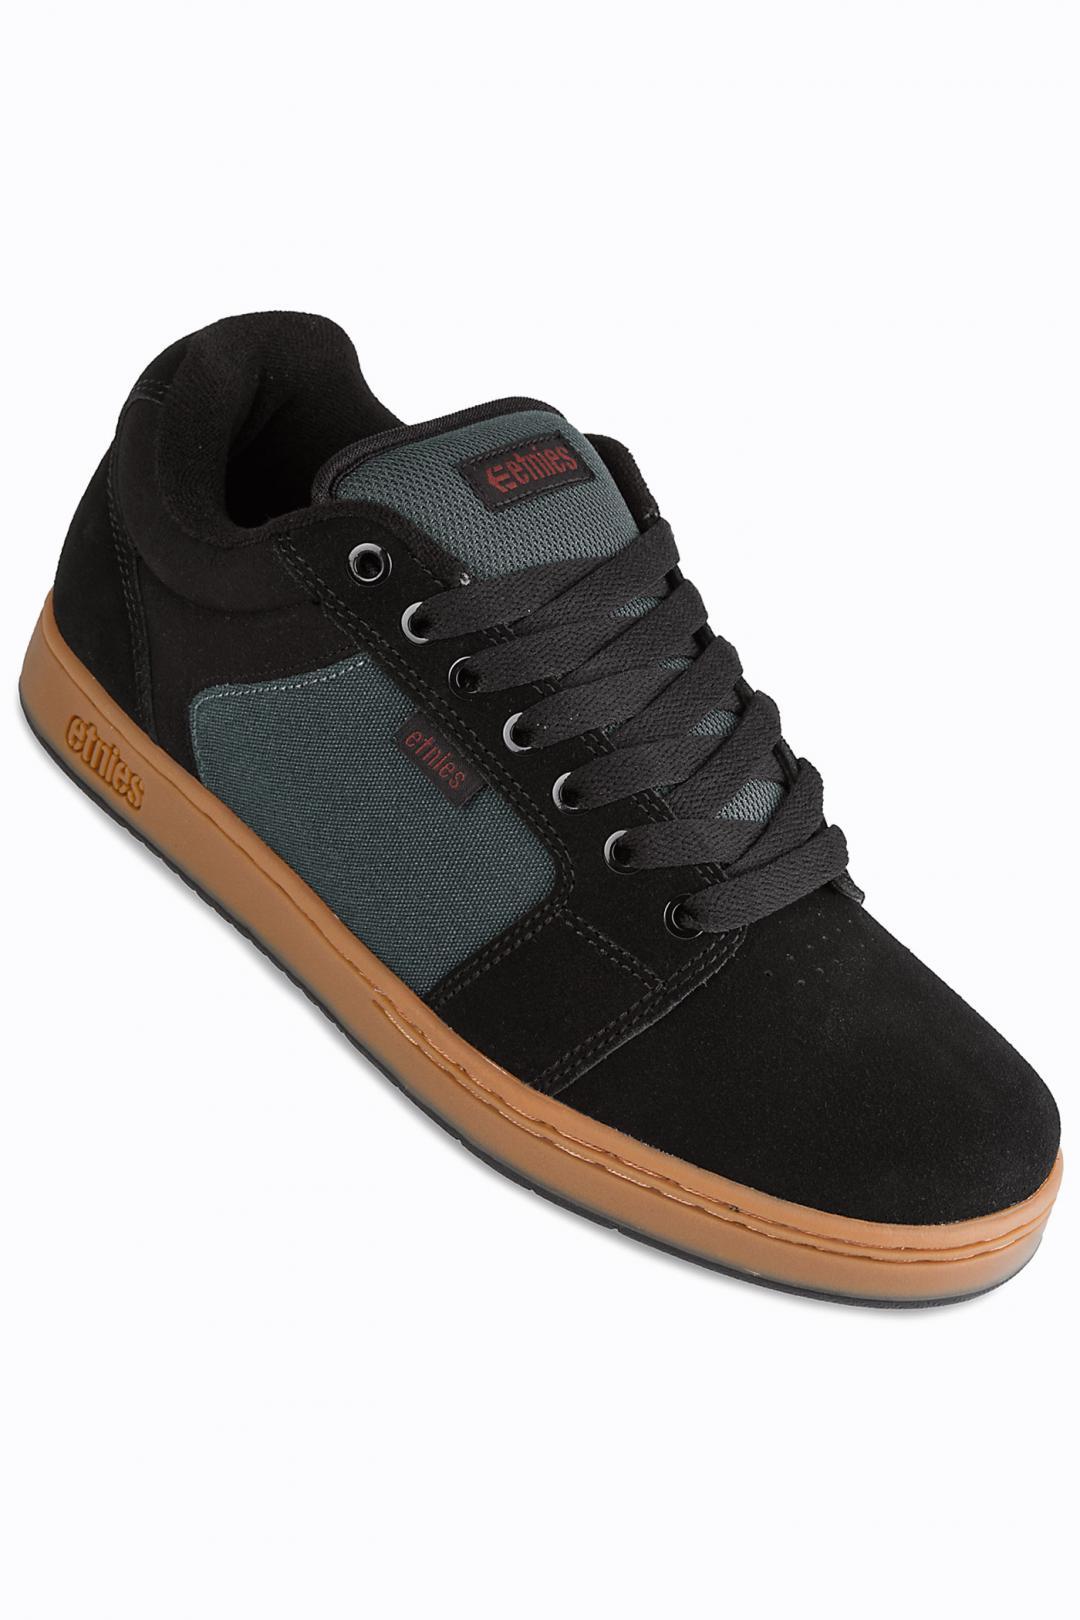 Uomo Etnies Barge XL black dark grey gum | Scarpe da skate